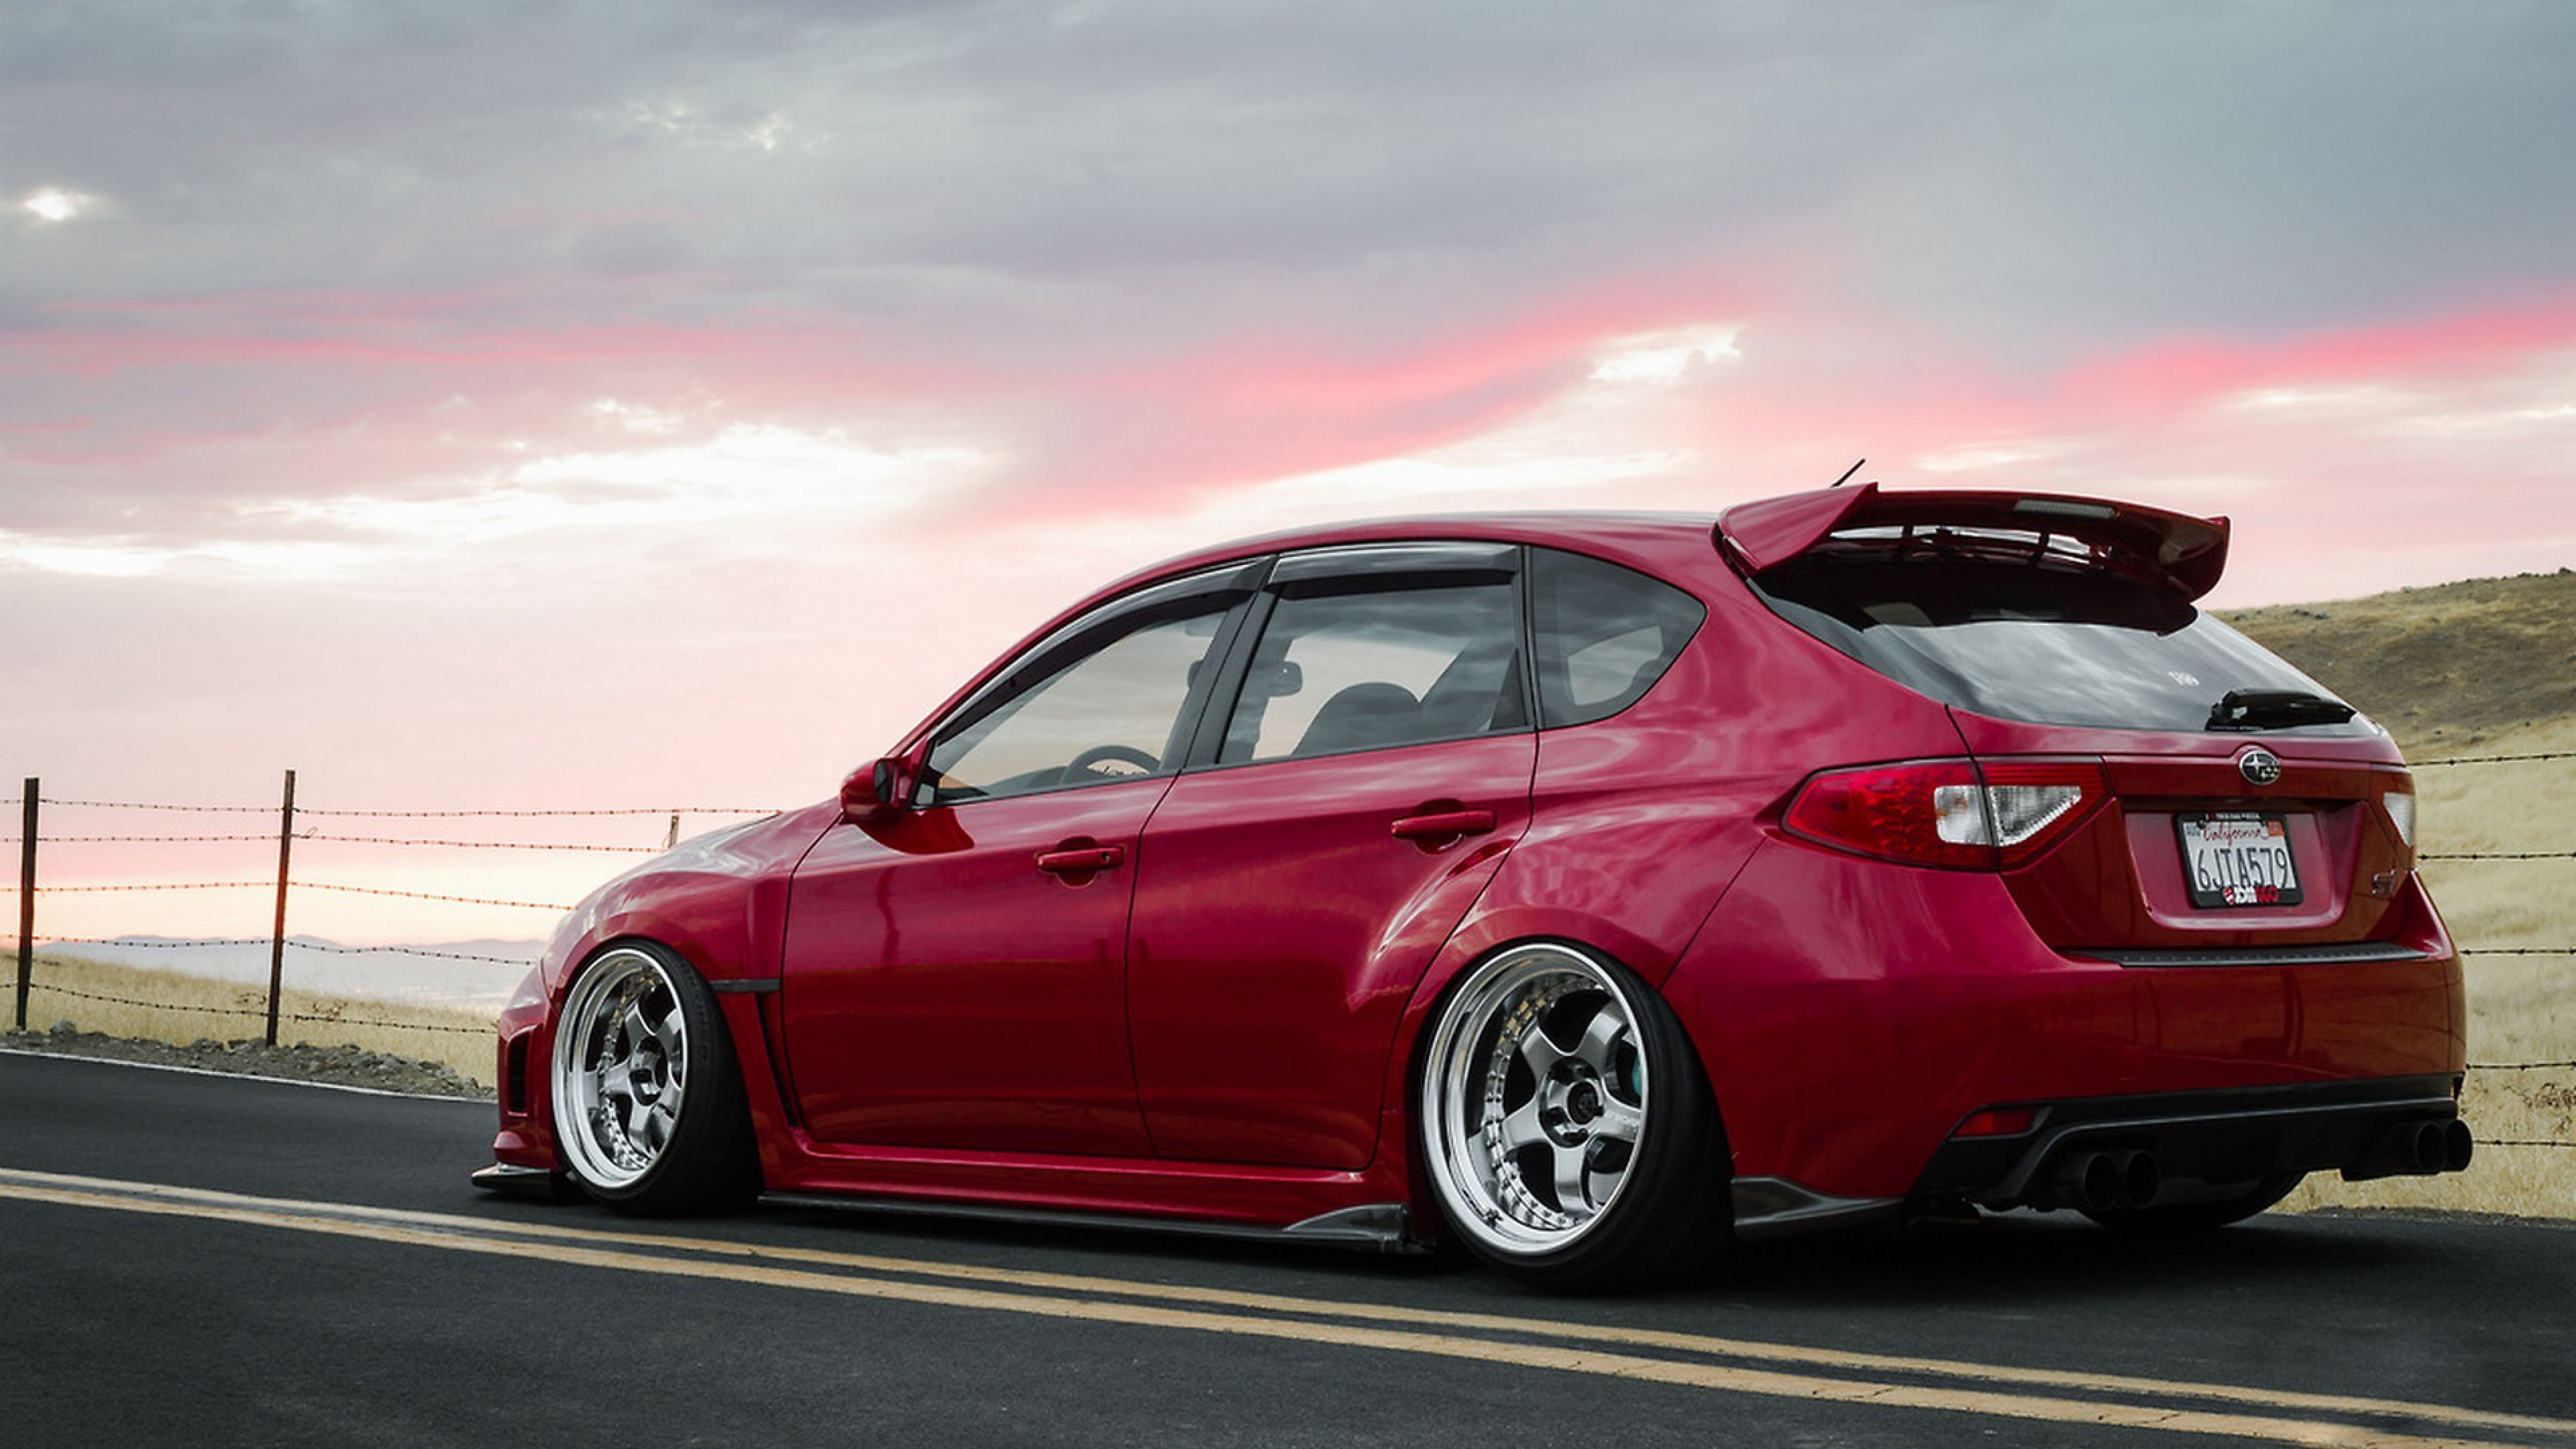 Subaru Impreza Wrx Sti Tuning Jdm Red Wallpaper Background 4K 3840x2160